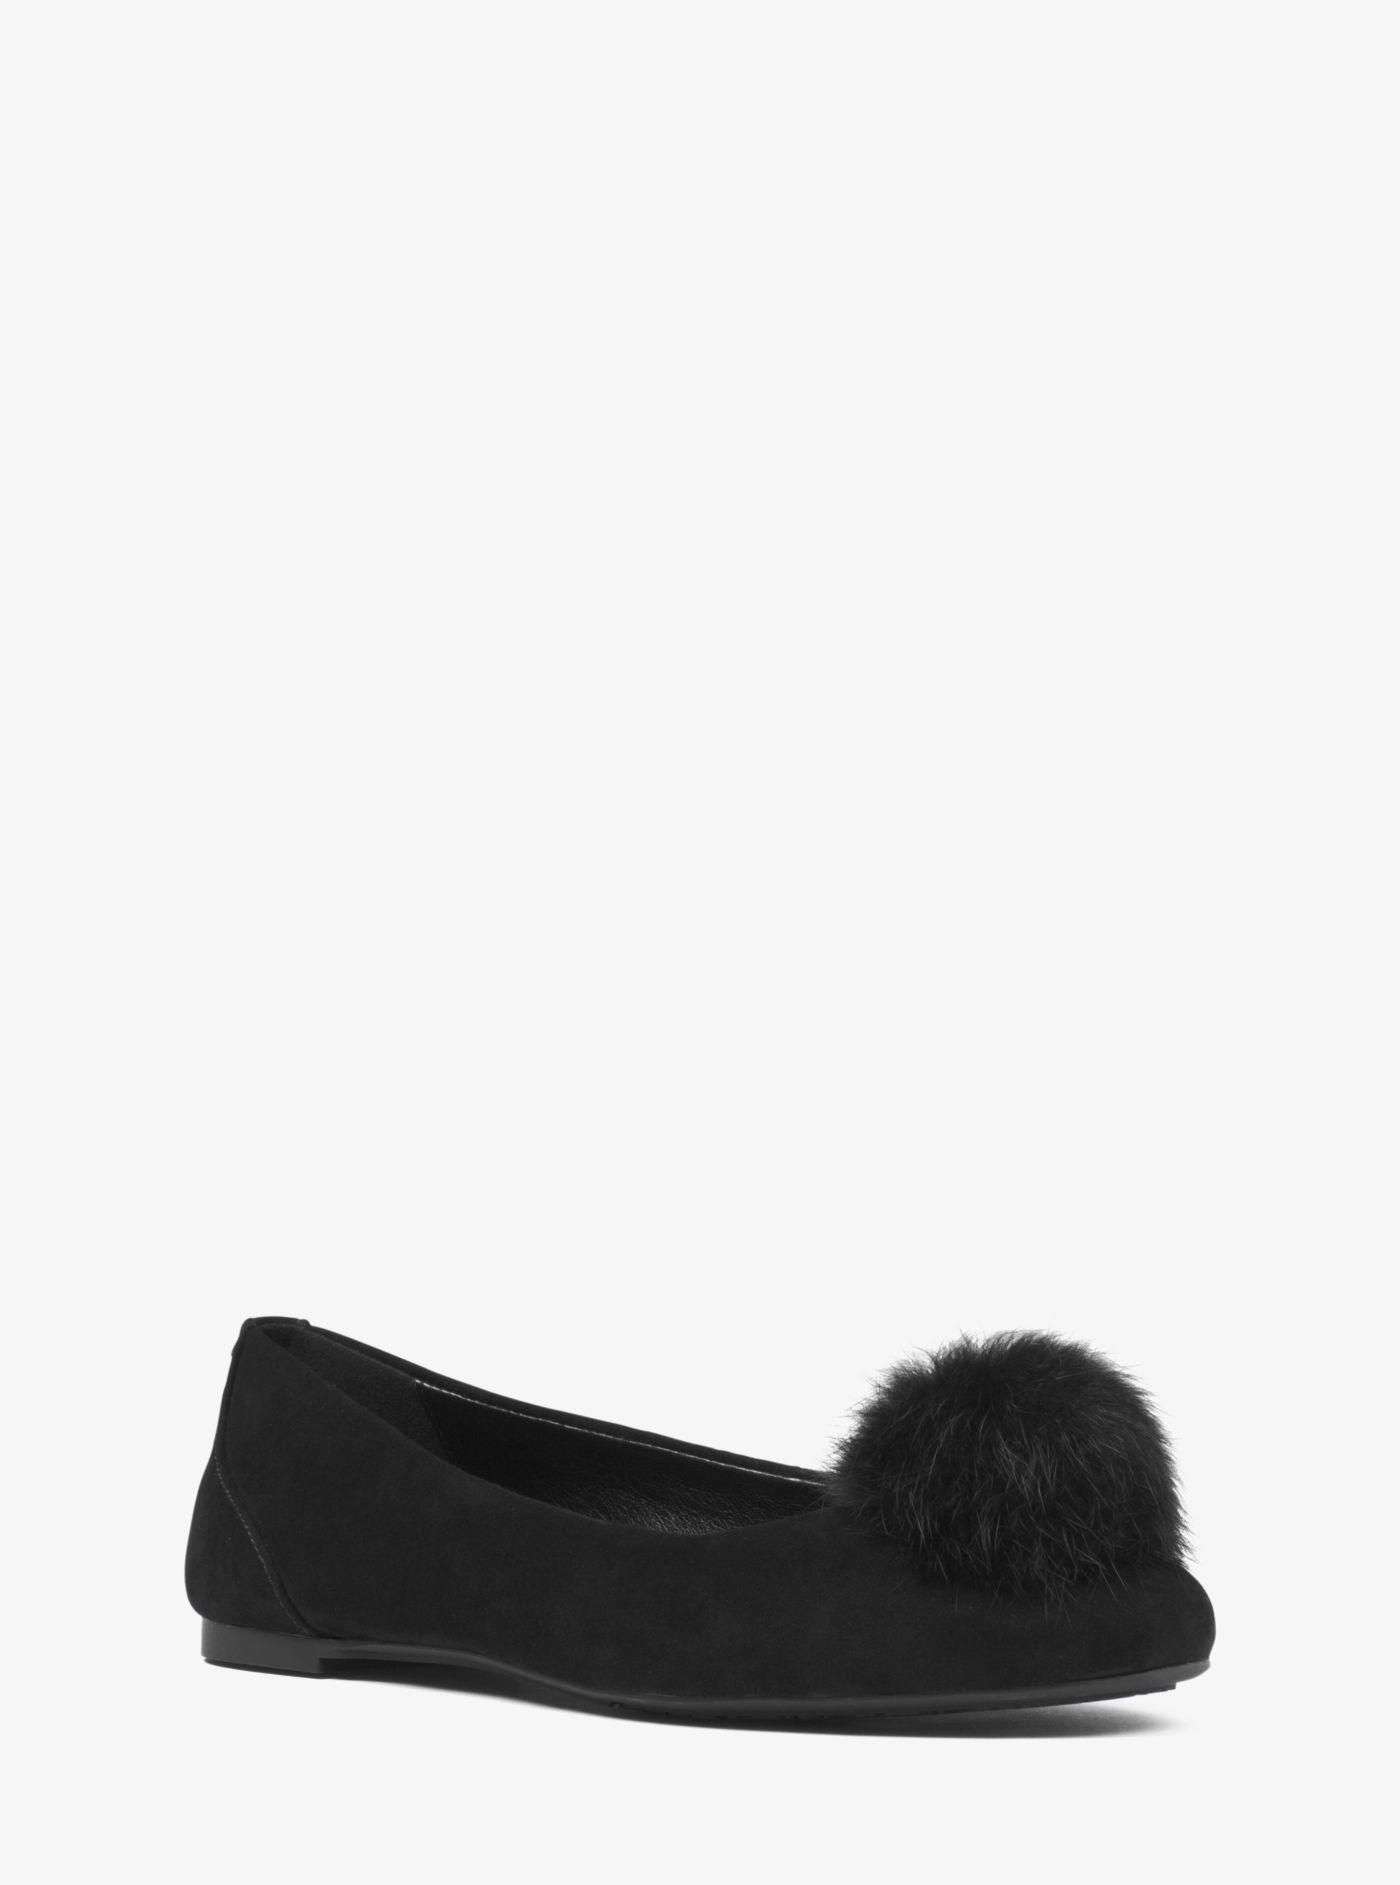 aea2806c0f4441 Lyst - Michael Kors Remi Pom-pom Suede Ballet Flat in Black